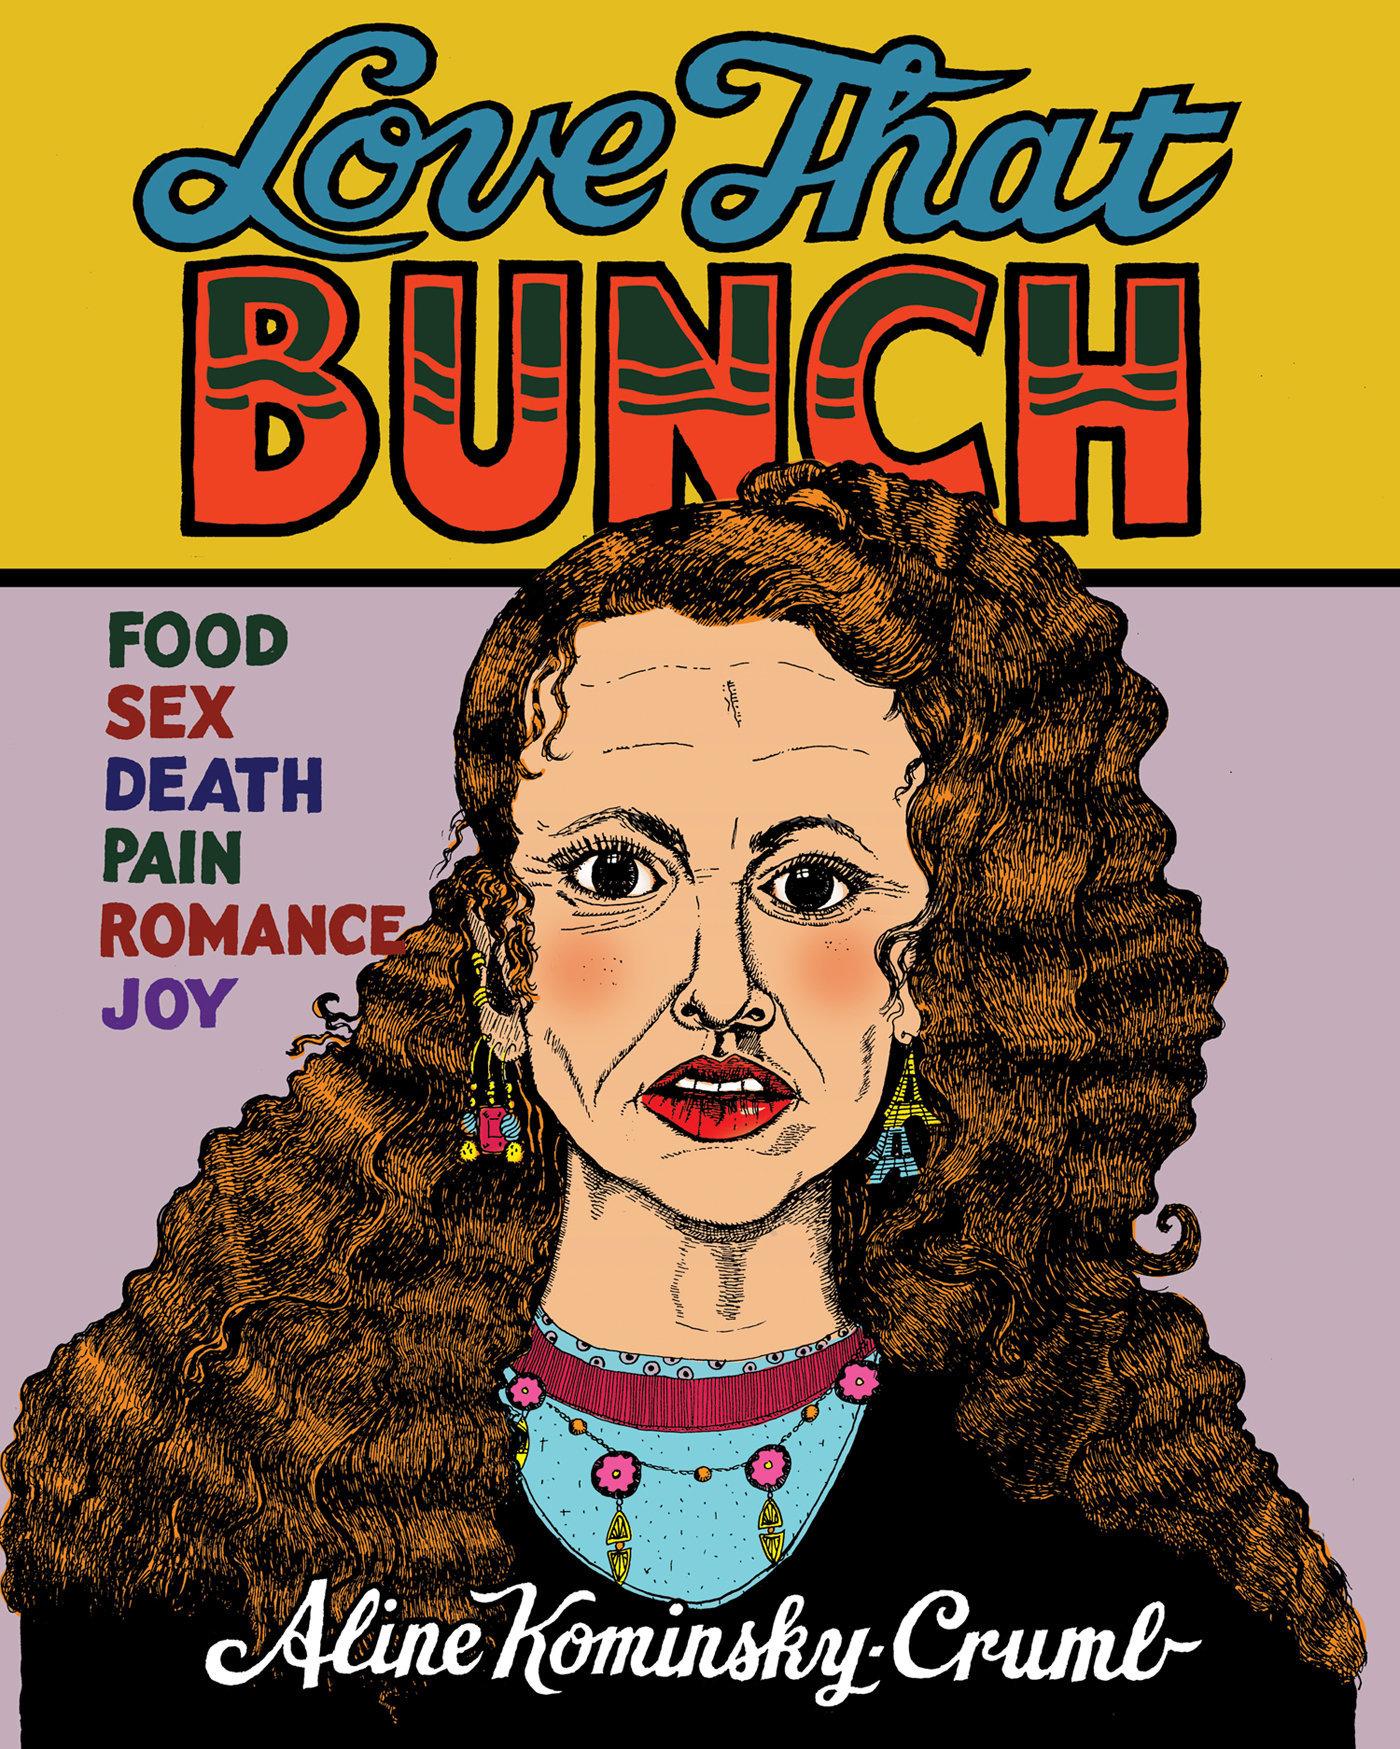 Aline Kominsky-Crumb Is A Horny, Abject Comic